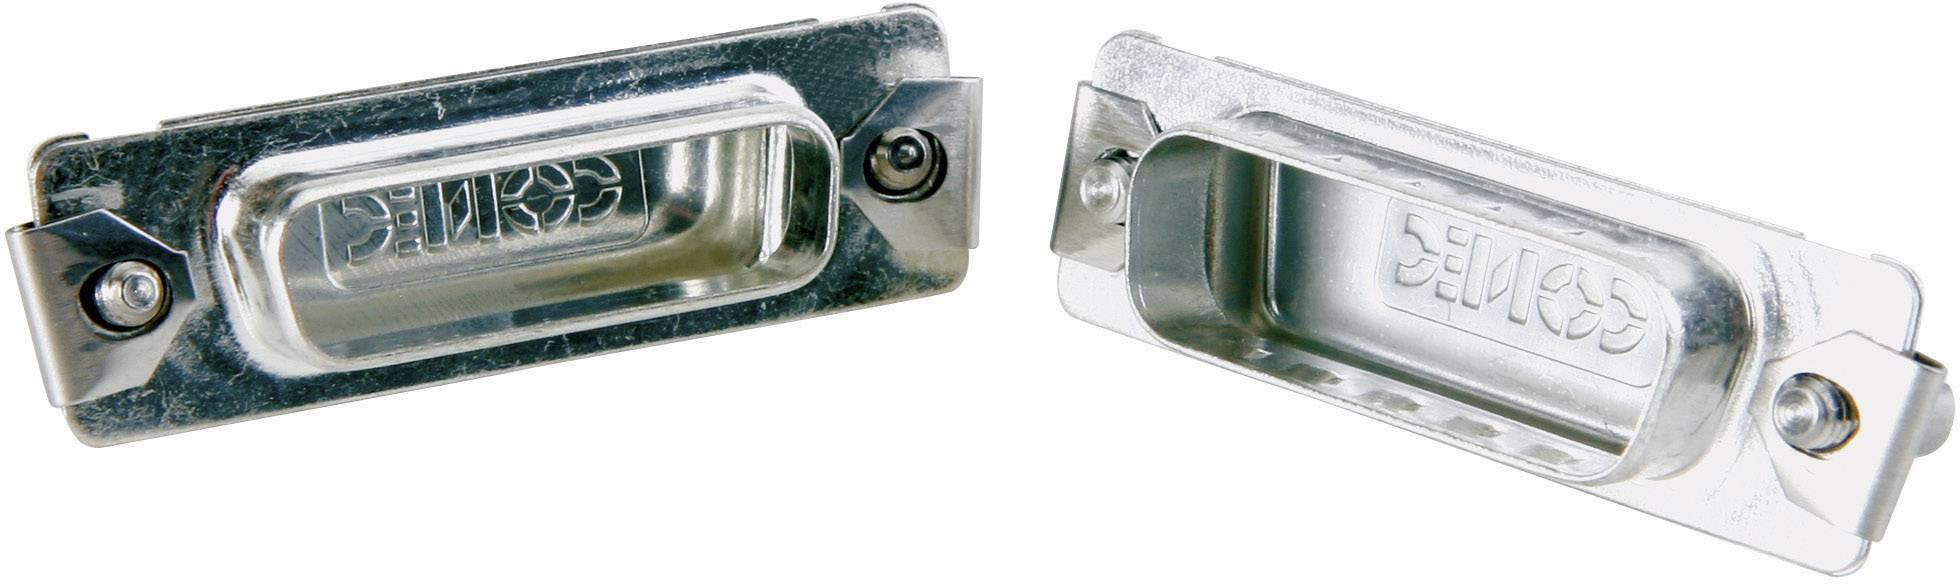 Záslepka D-SUB konektoru Conec 165X16799X pro37pólovou kolíkovou D-SUB lištu, stříbrná, 1 ks